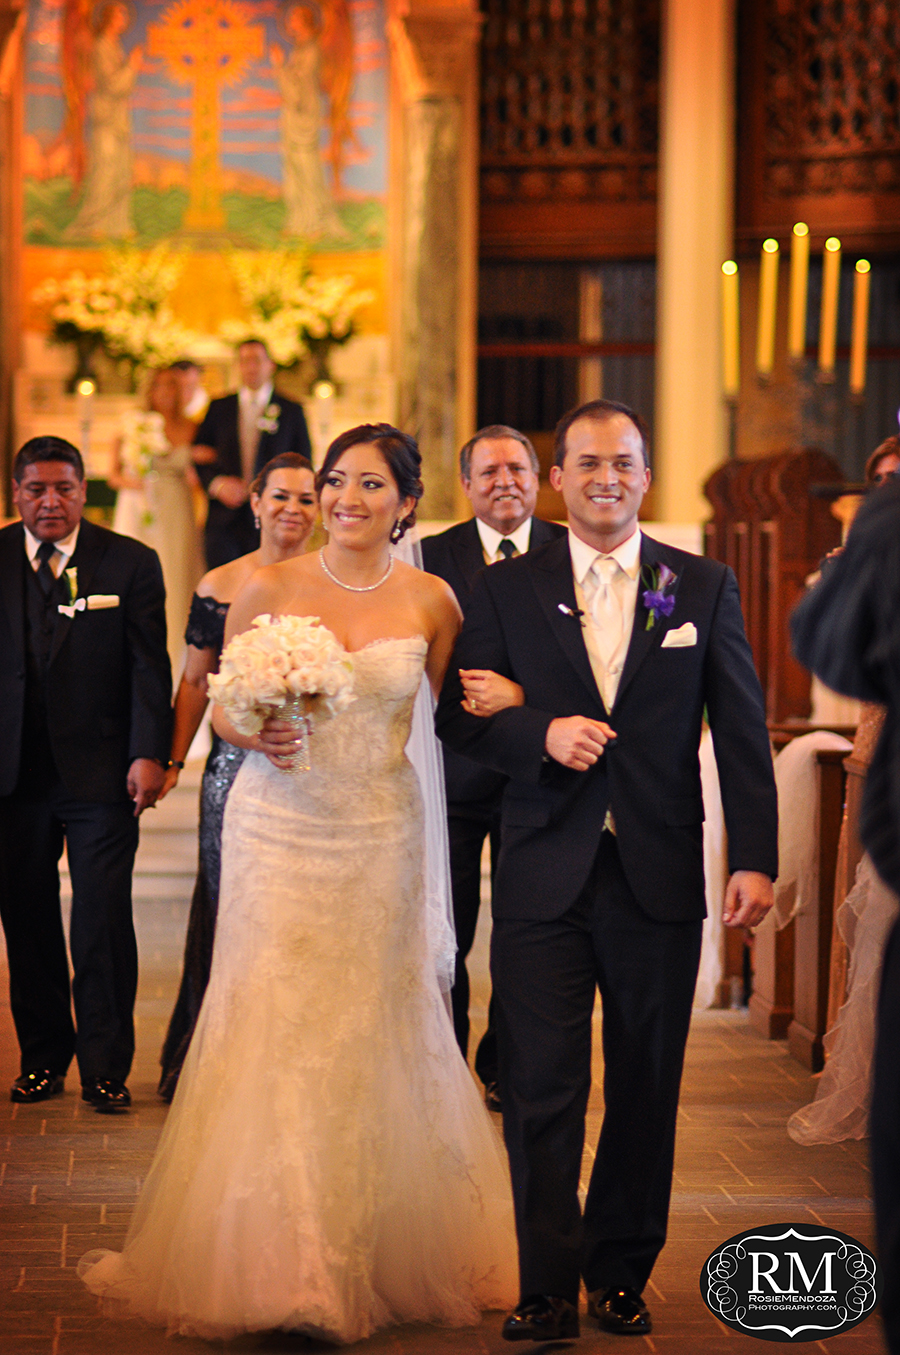 Downtown-Miami-Trinity-Episcopal-Cathedral-wedding-ceremony-exit-photo